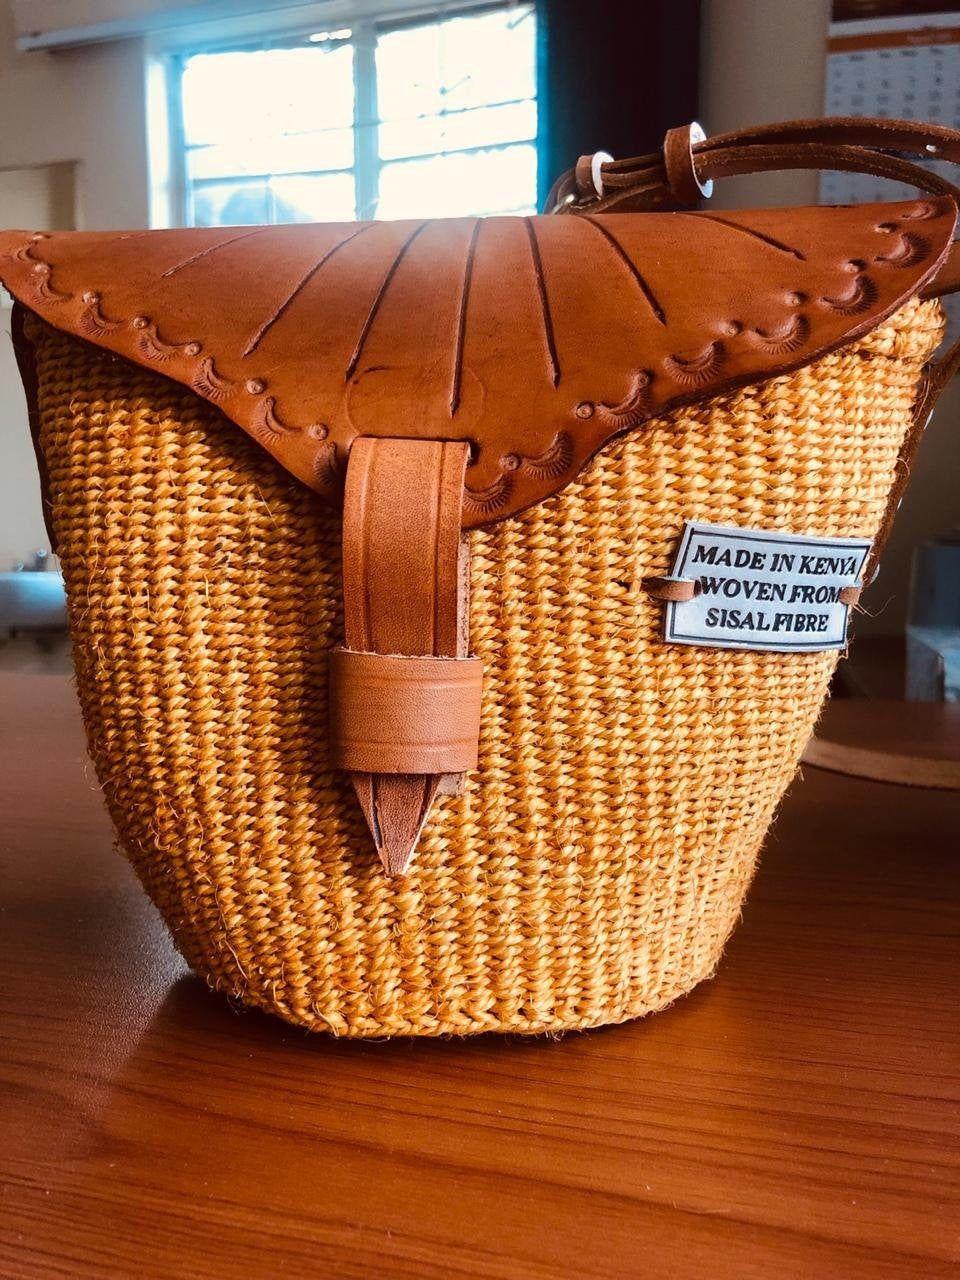 Sisal NEW Basket Handbag African Kiondo Organic Handmade in Kenya Tote